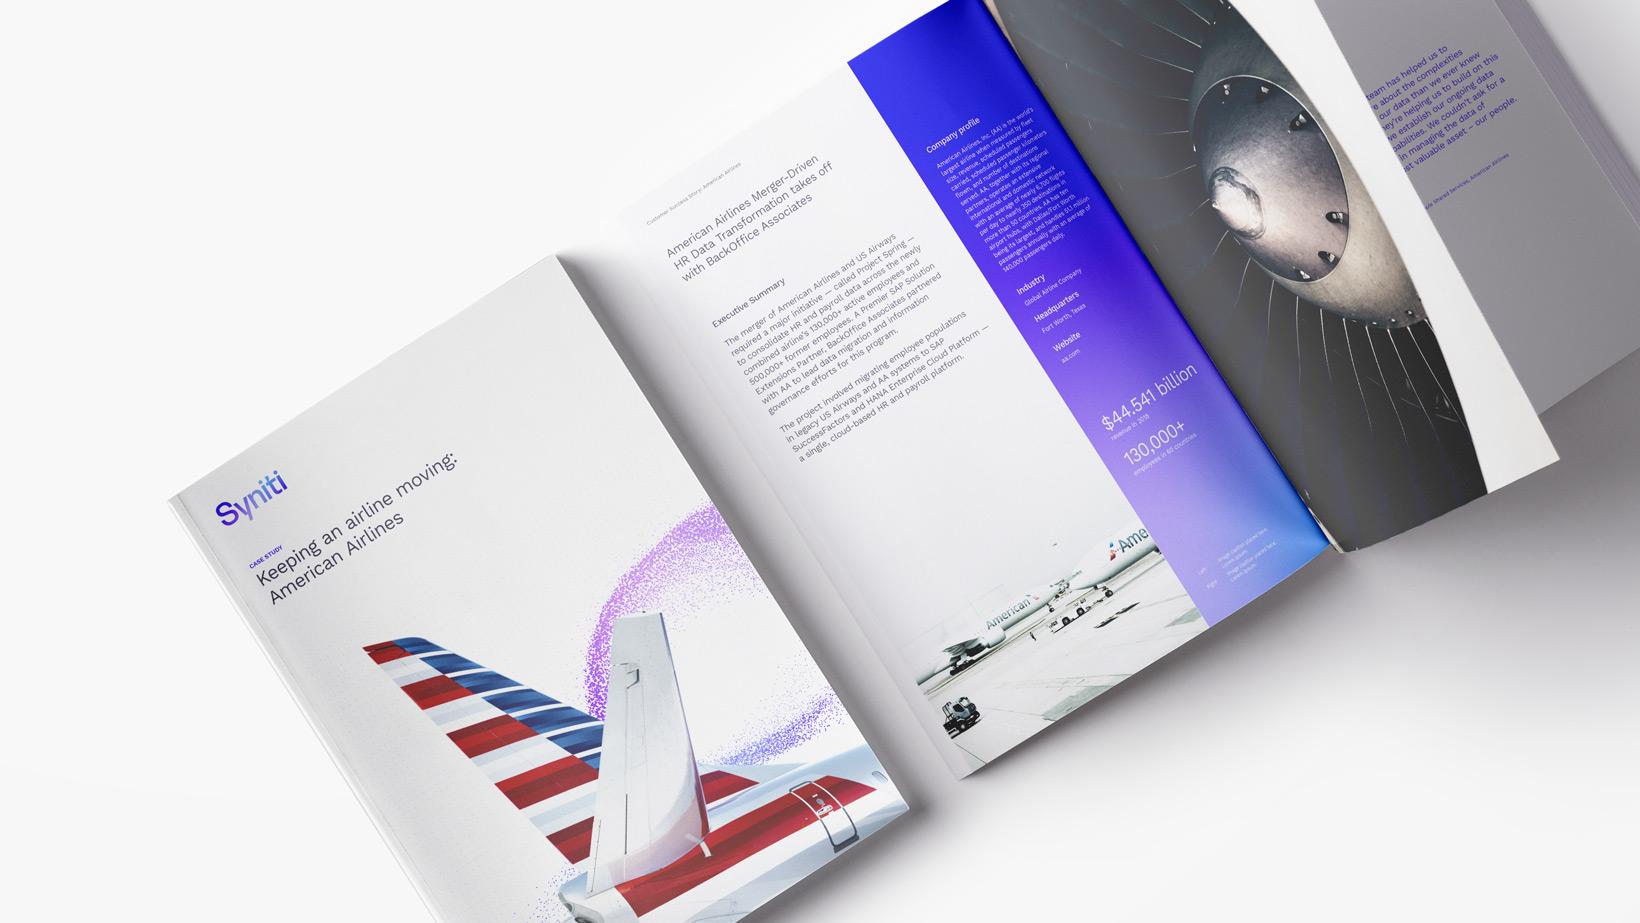 Confederation-Studio-Syniti-Branding-Literature.jpg